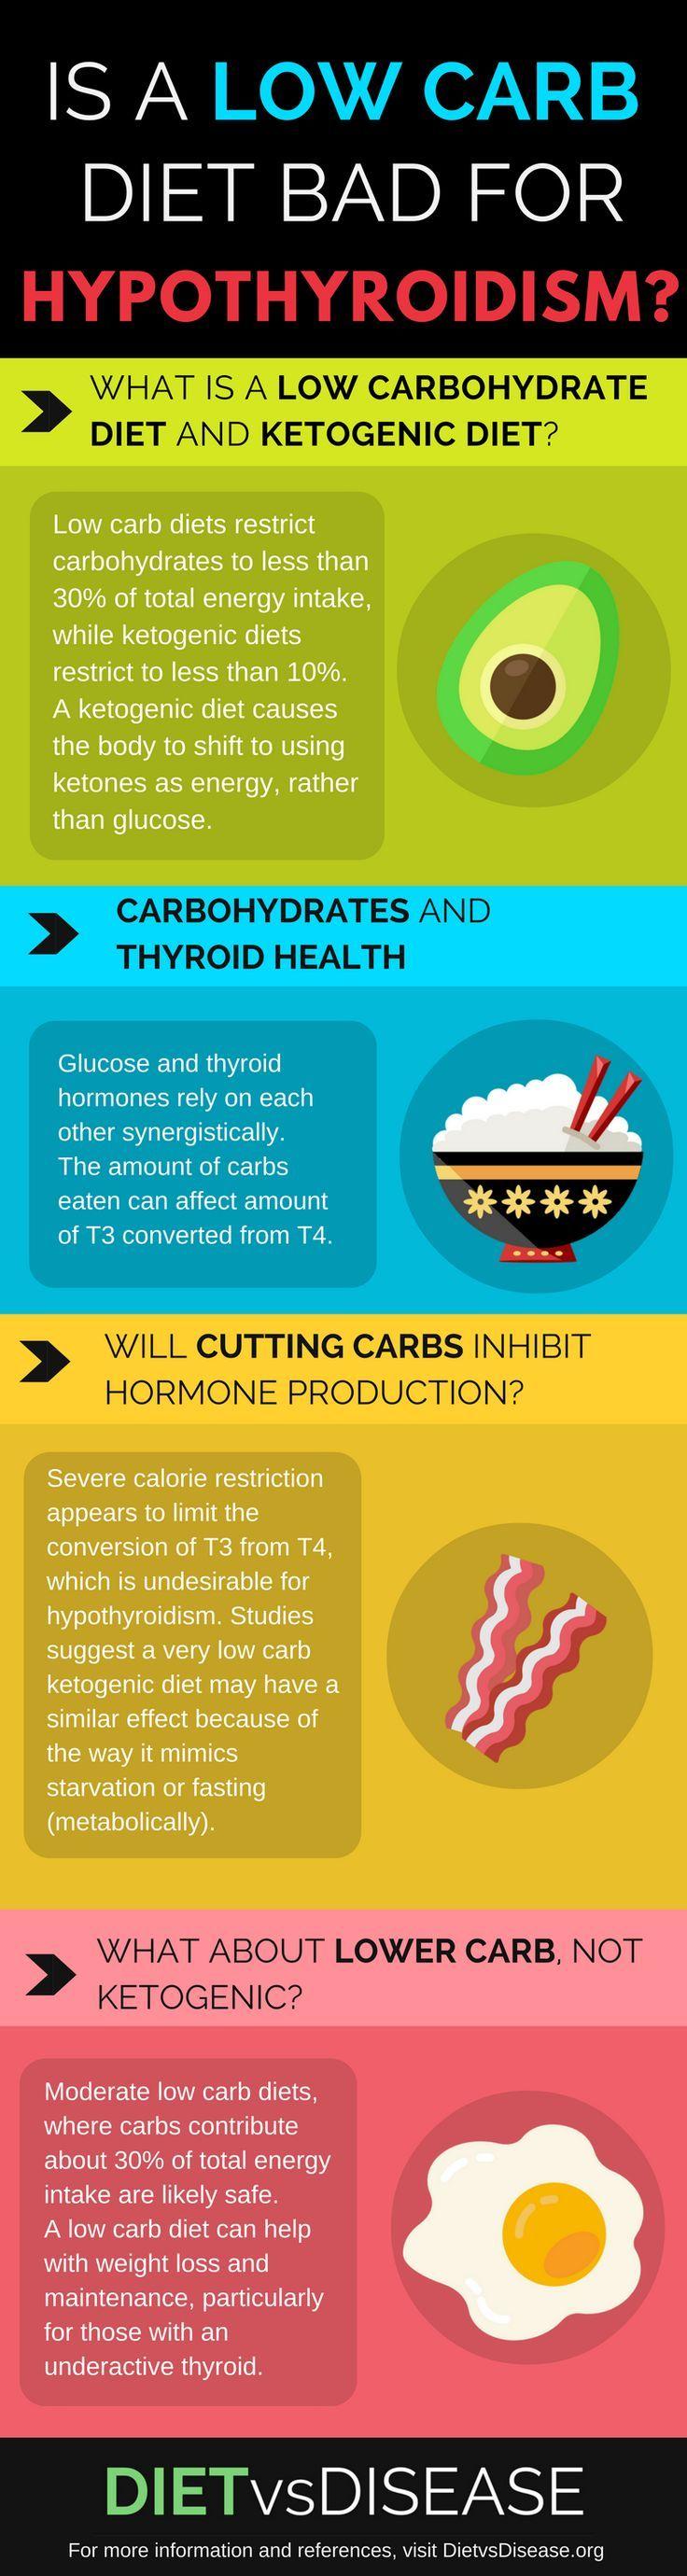 hyperthyroidism low carb diet